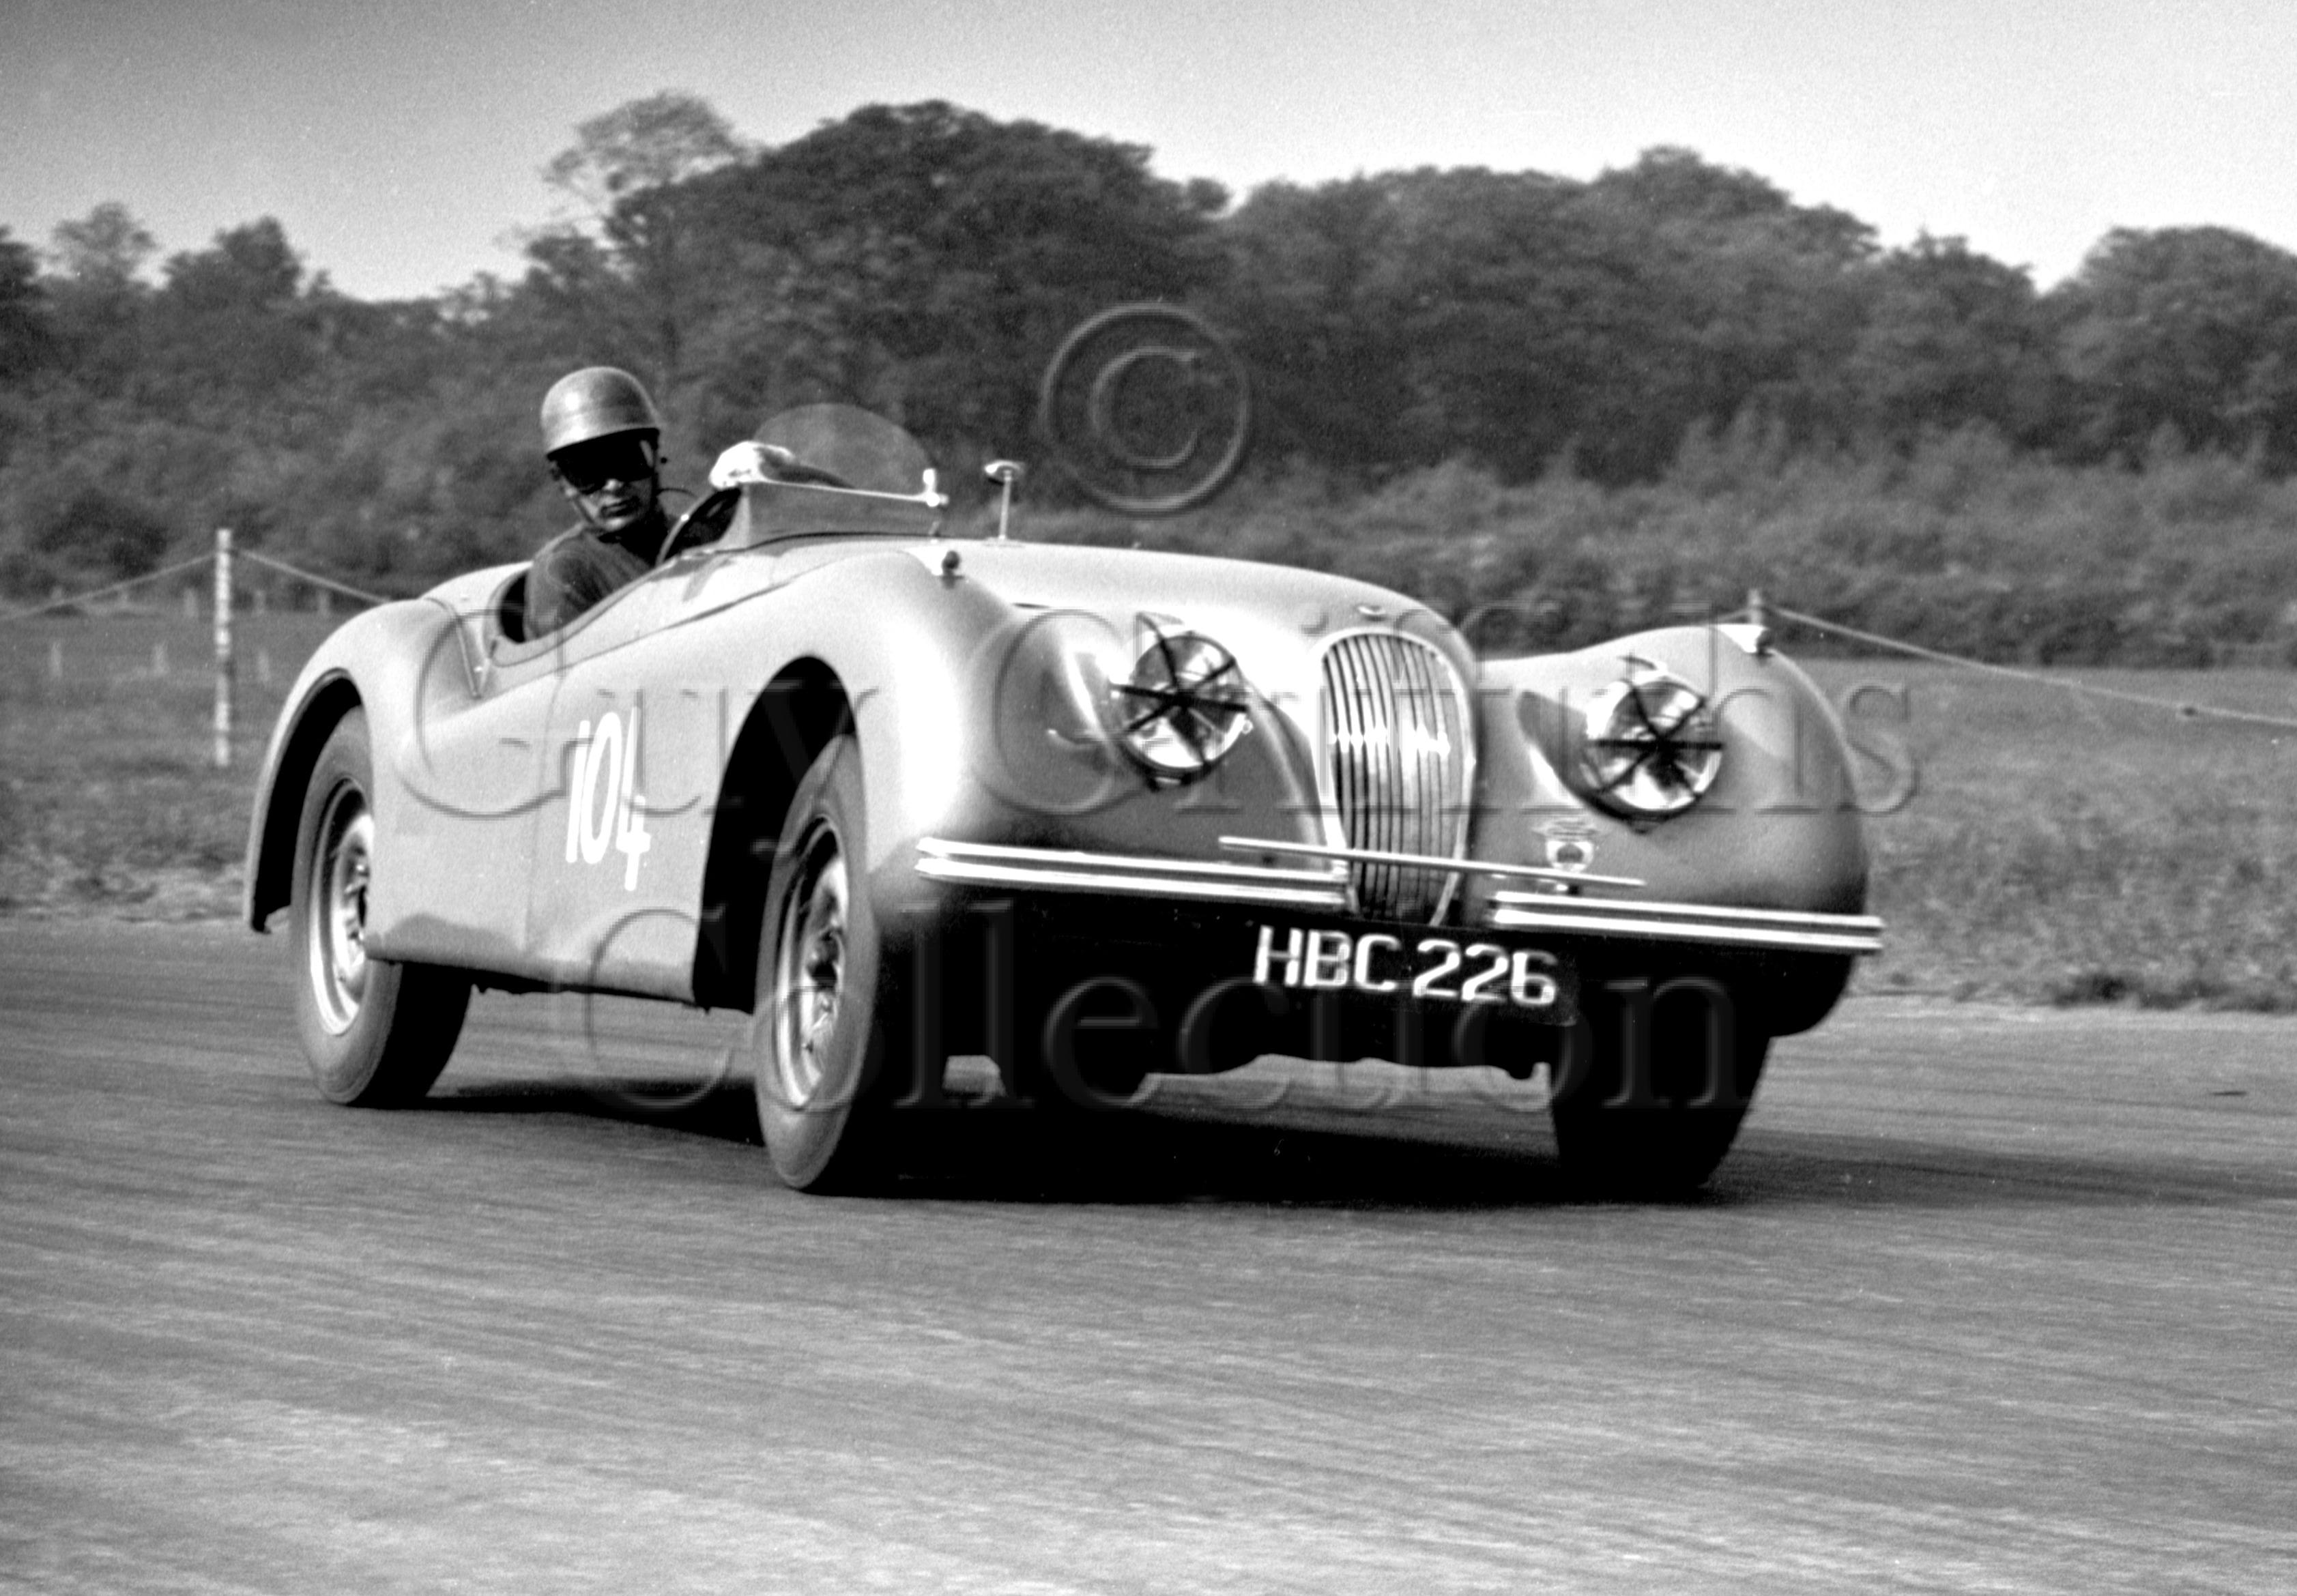 55-202–R-Salvadori–Jaguar–Silverstone–24-05-1952.jpg - Guy Griffiths Collection